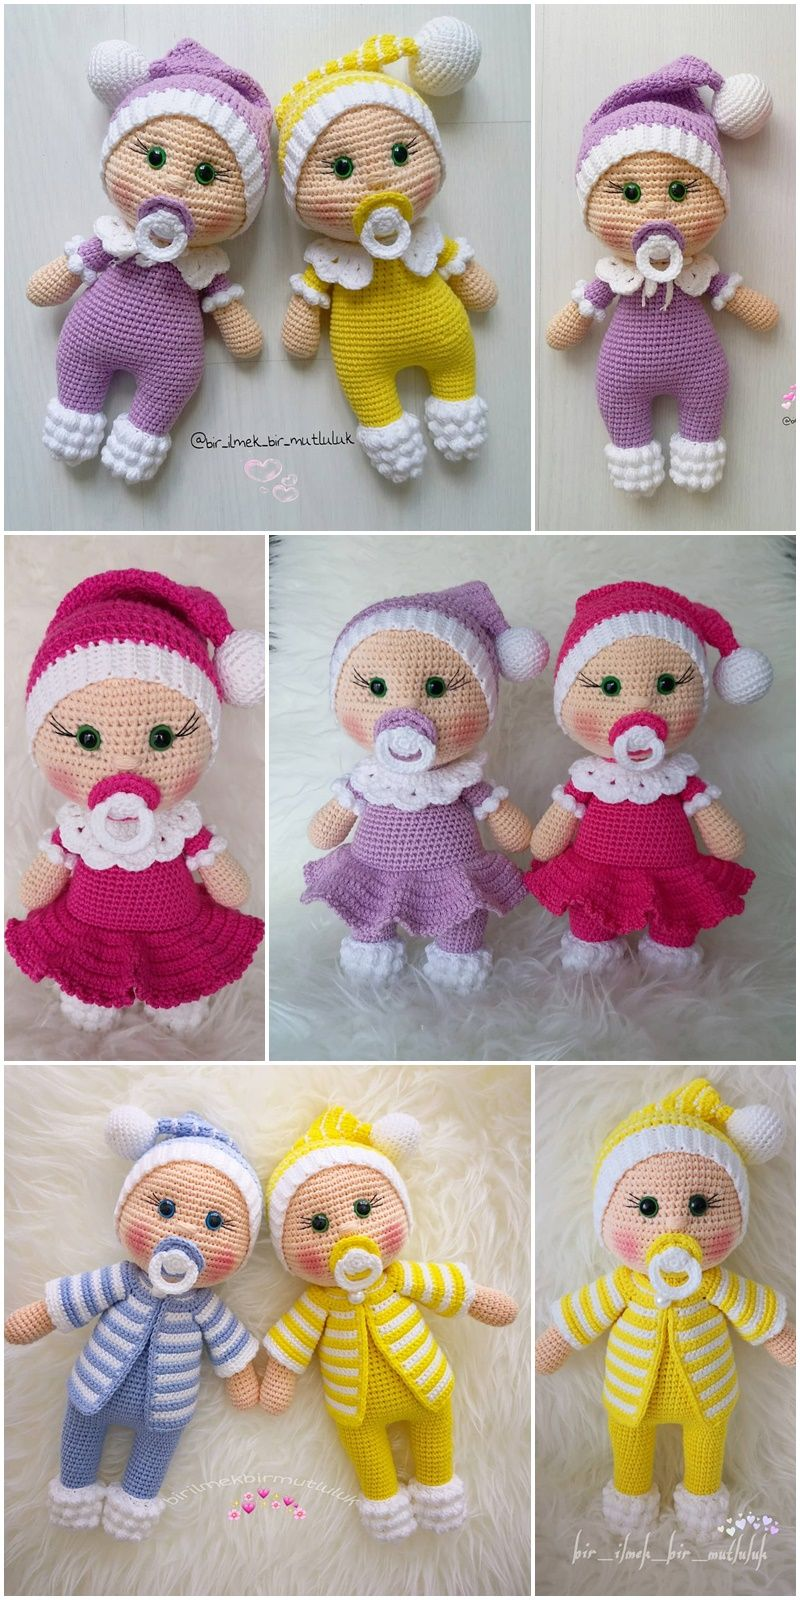 Amigurumi Doll Teddy Bear Crochet Pattern Knitting | 1600x800